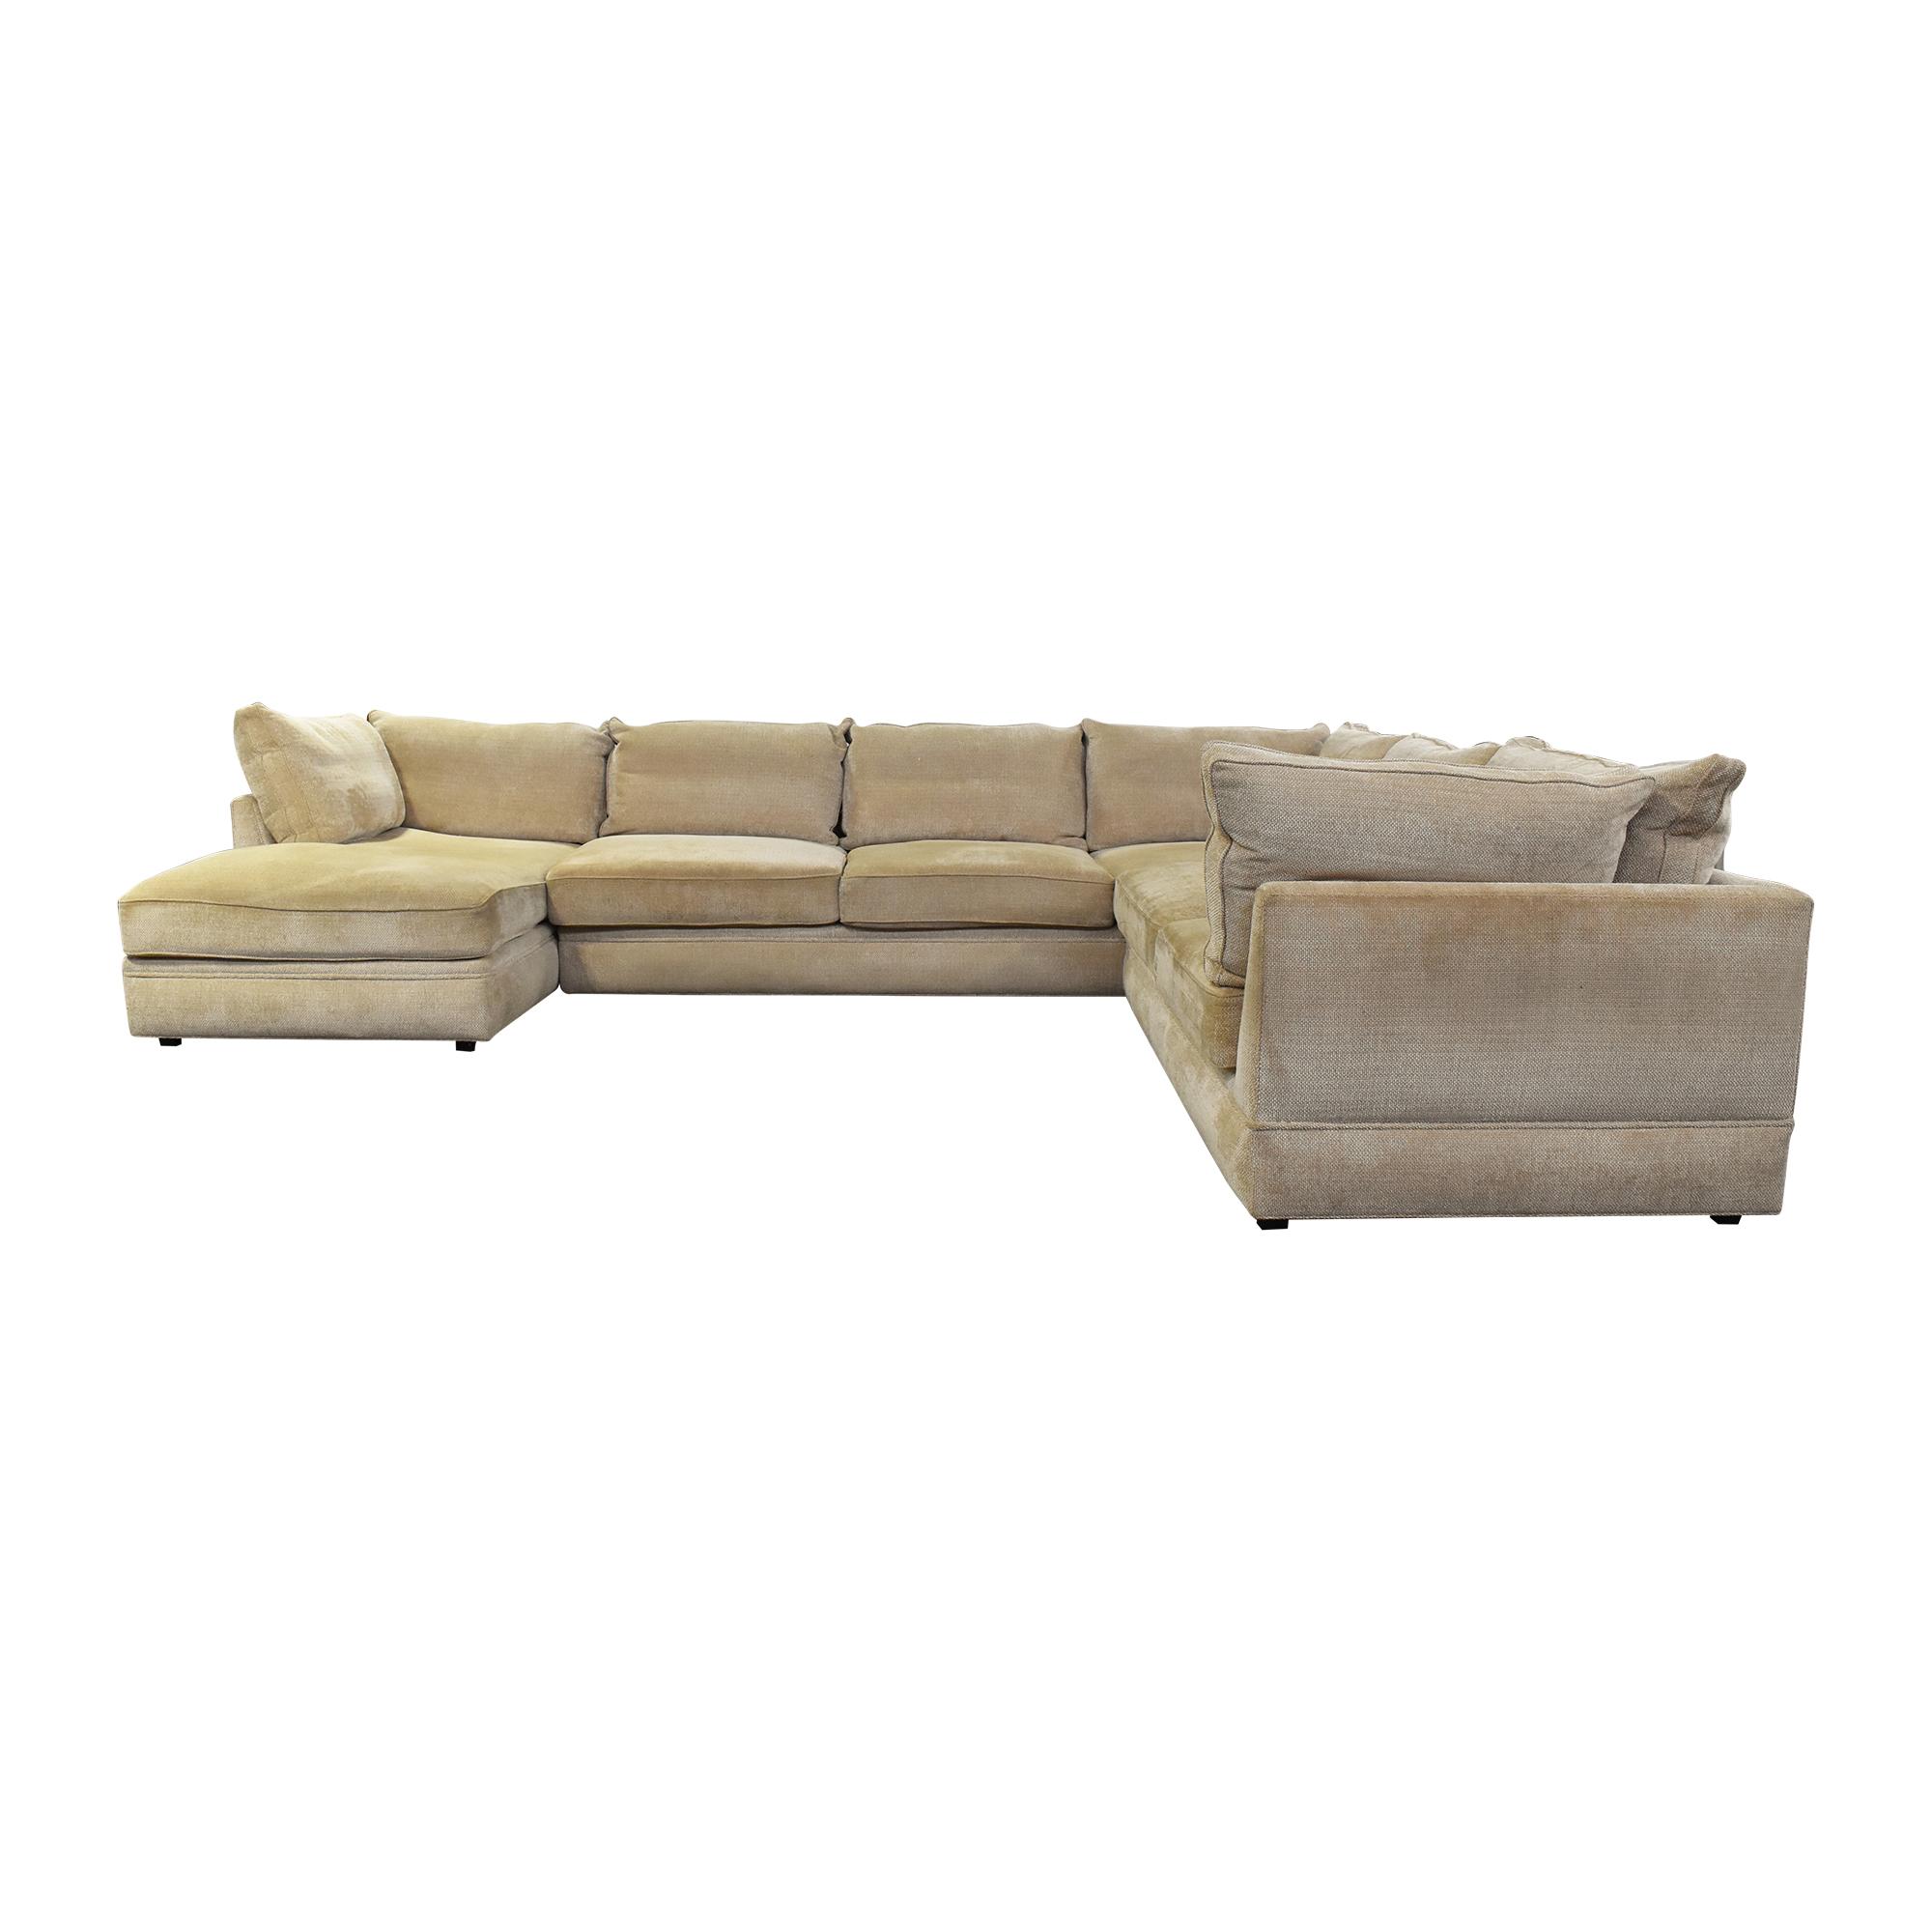 Swaim Swaim Three Piece Chaise Sectional Sofa tan